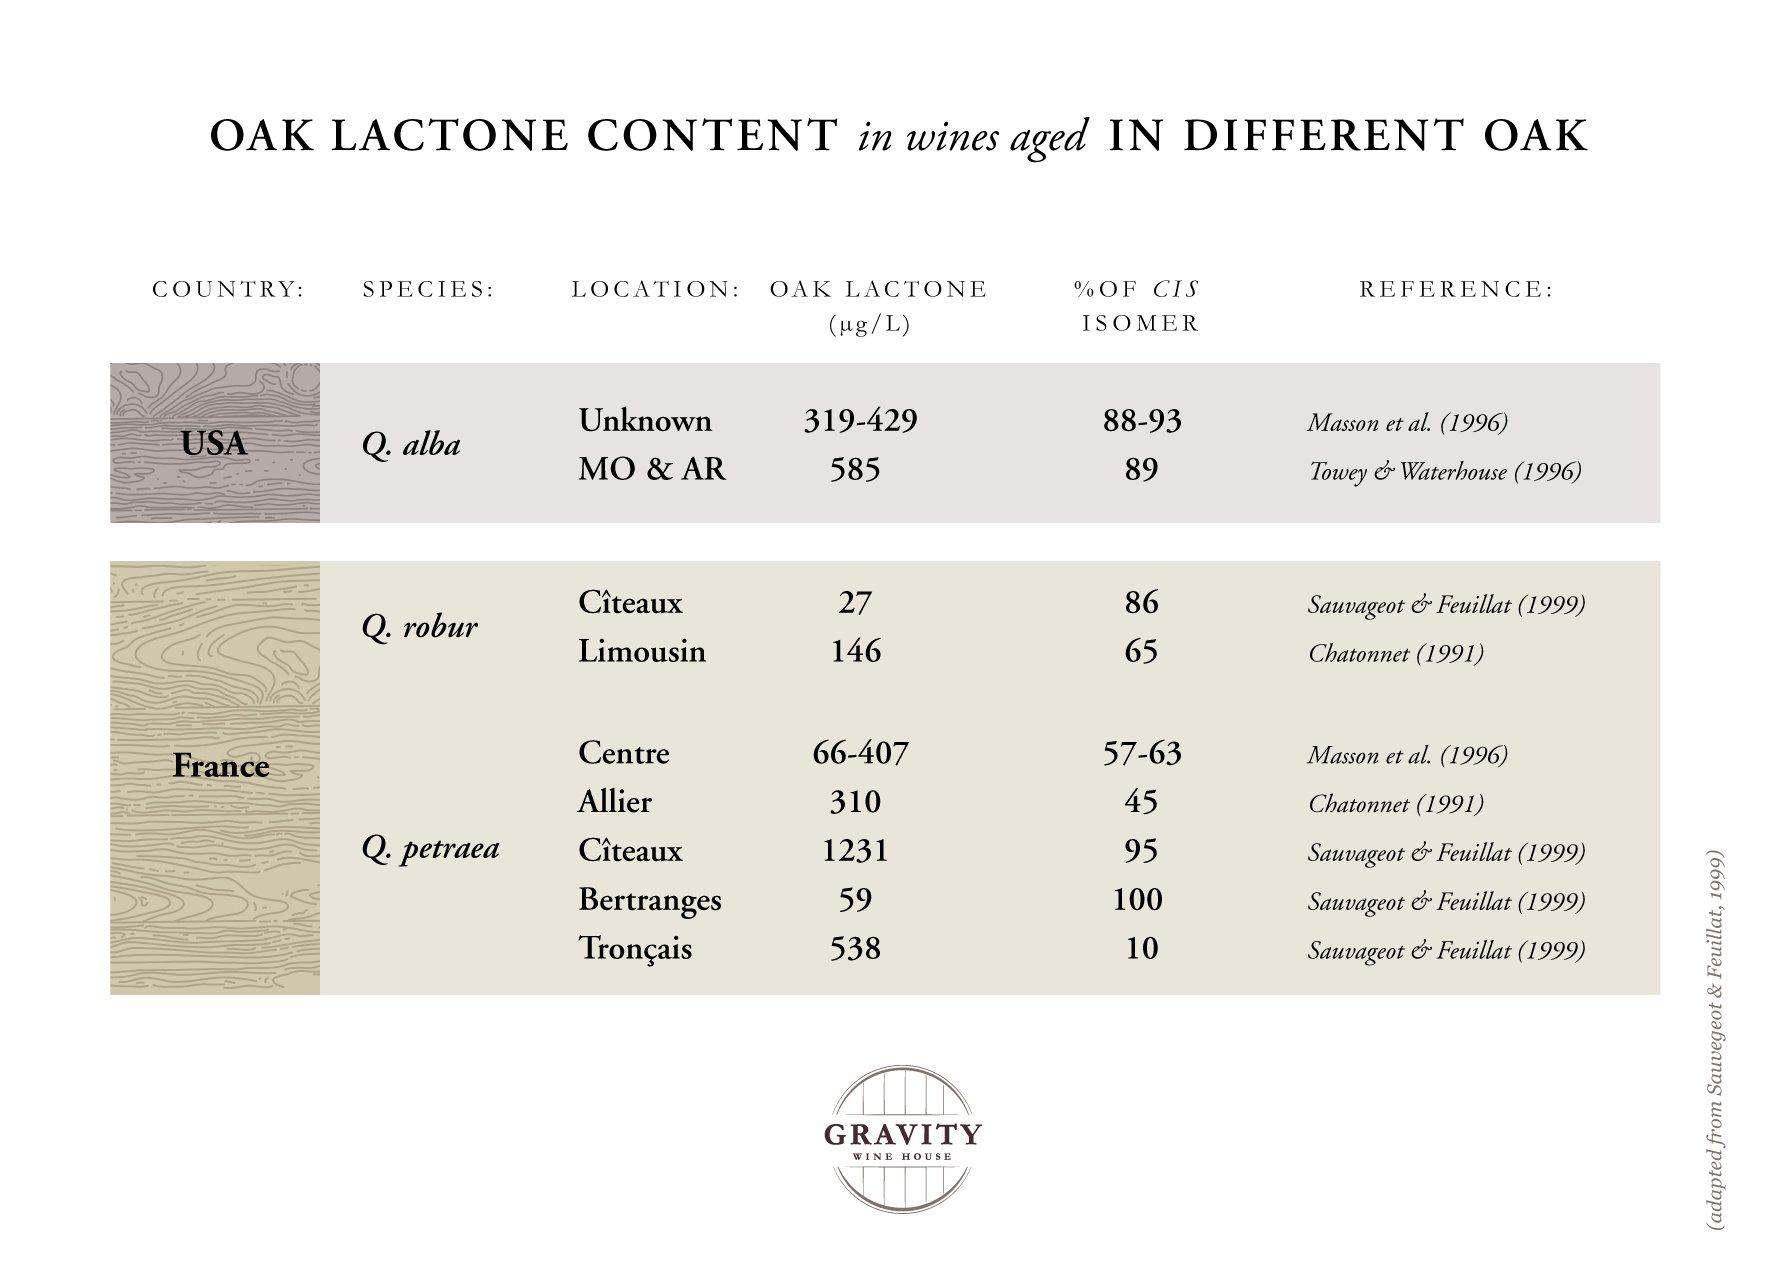 Oak Lactone Content in Wine Aged in Different Oak